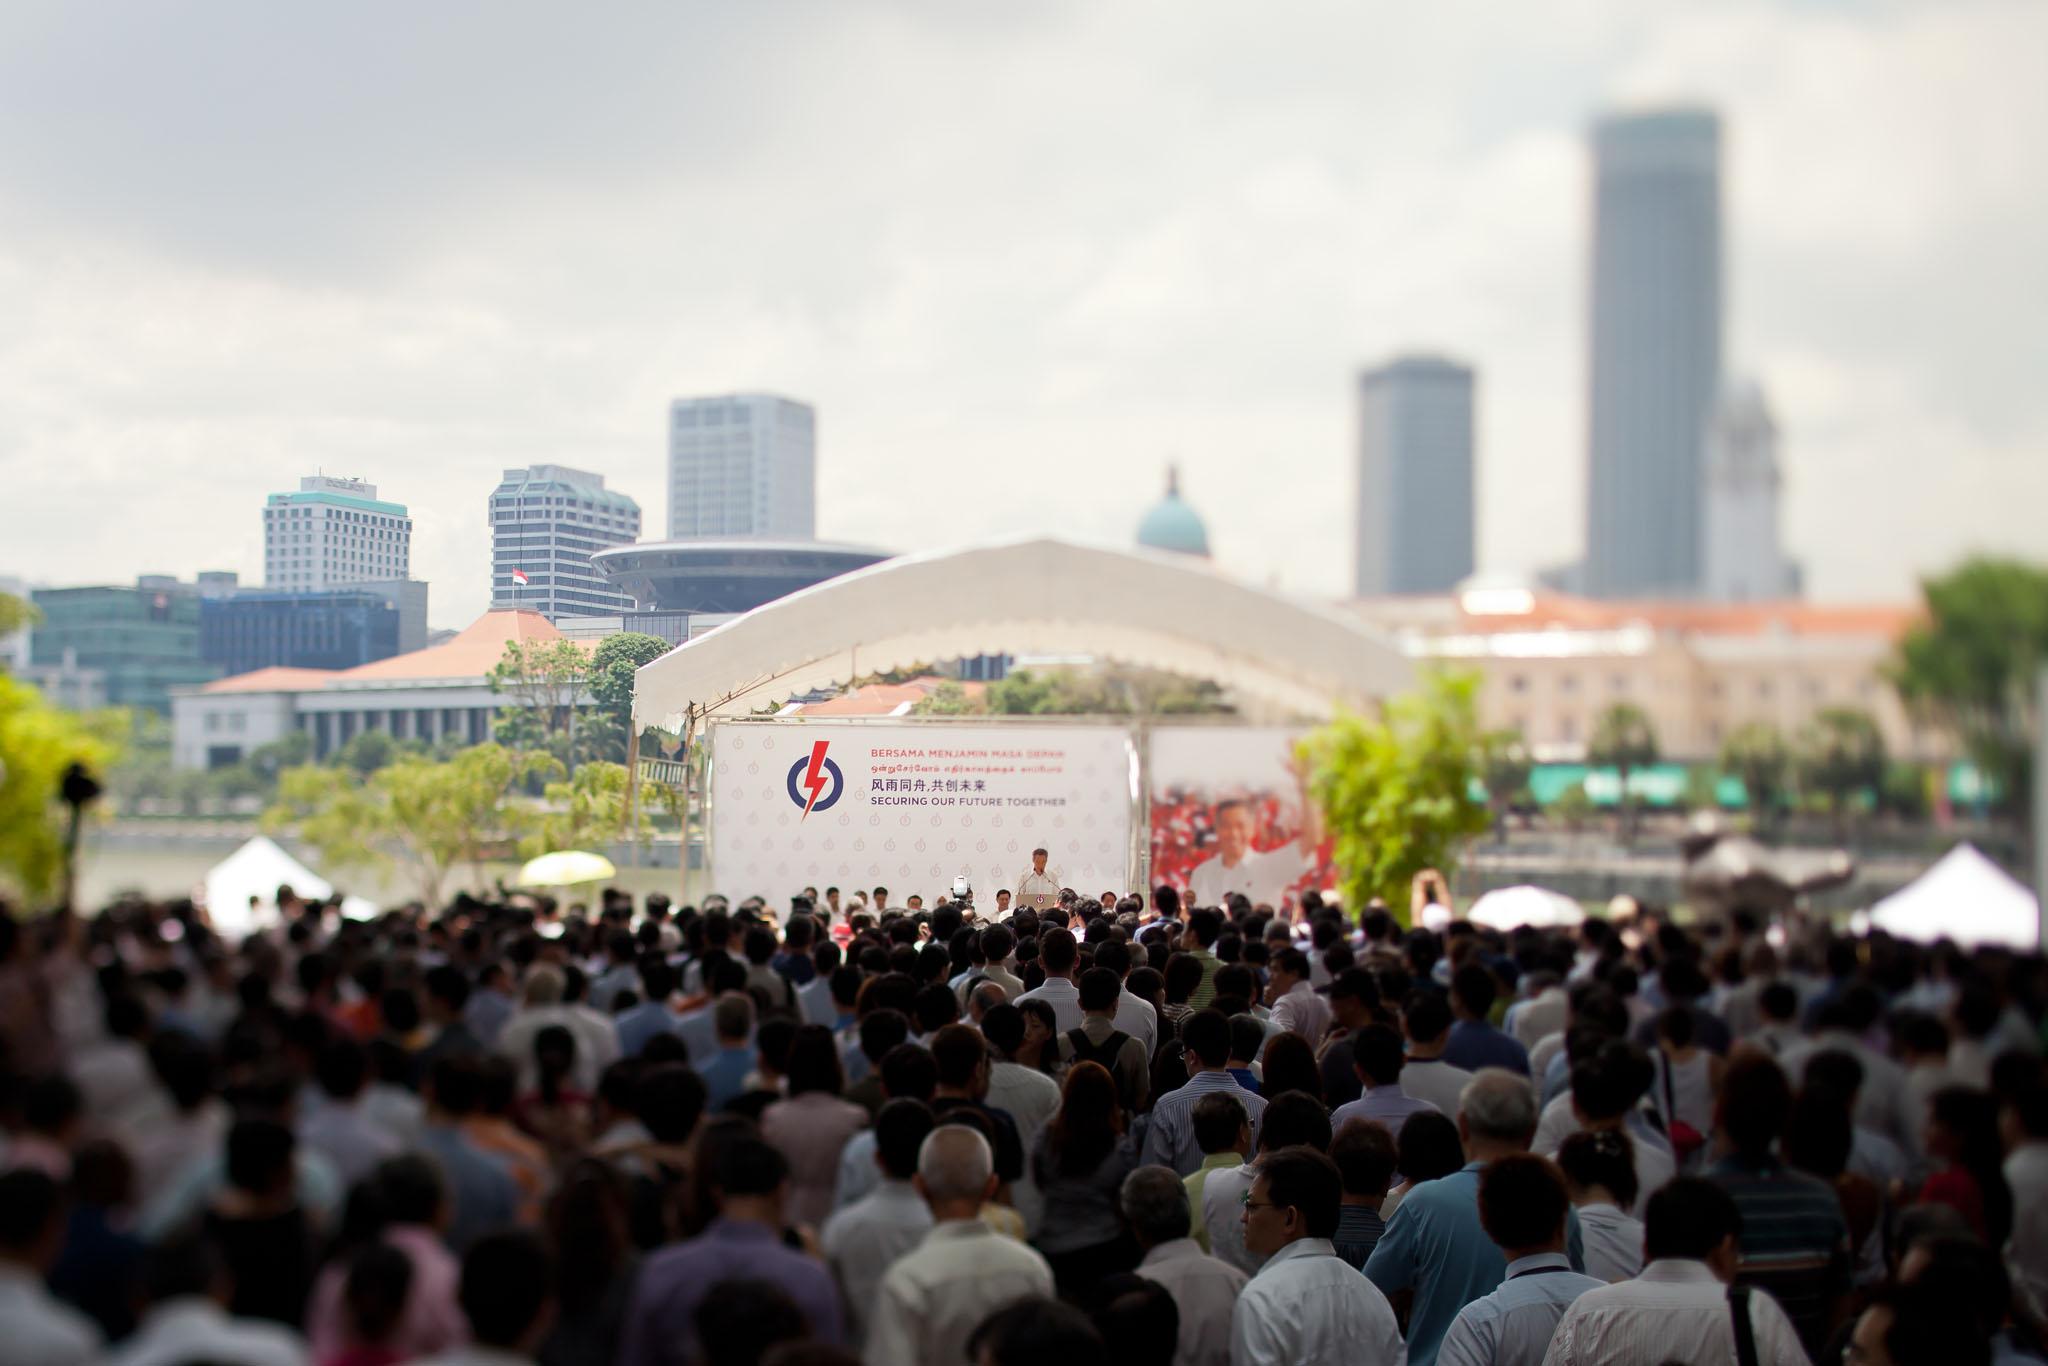 singapore-commercial-photographer-editorial-documentary-tiltshift-singaplural-zakaria-zainal-08.jpg